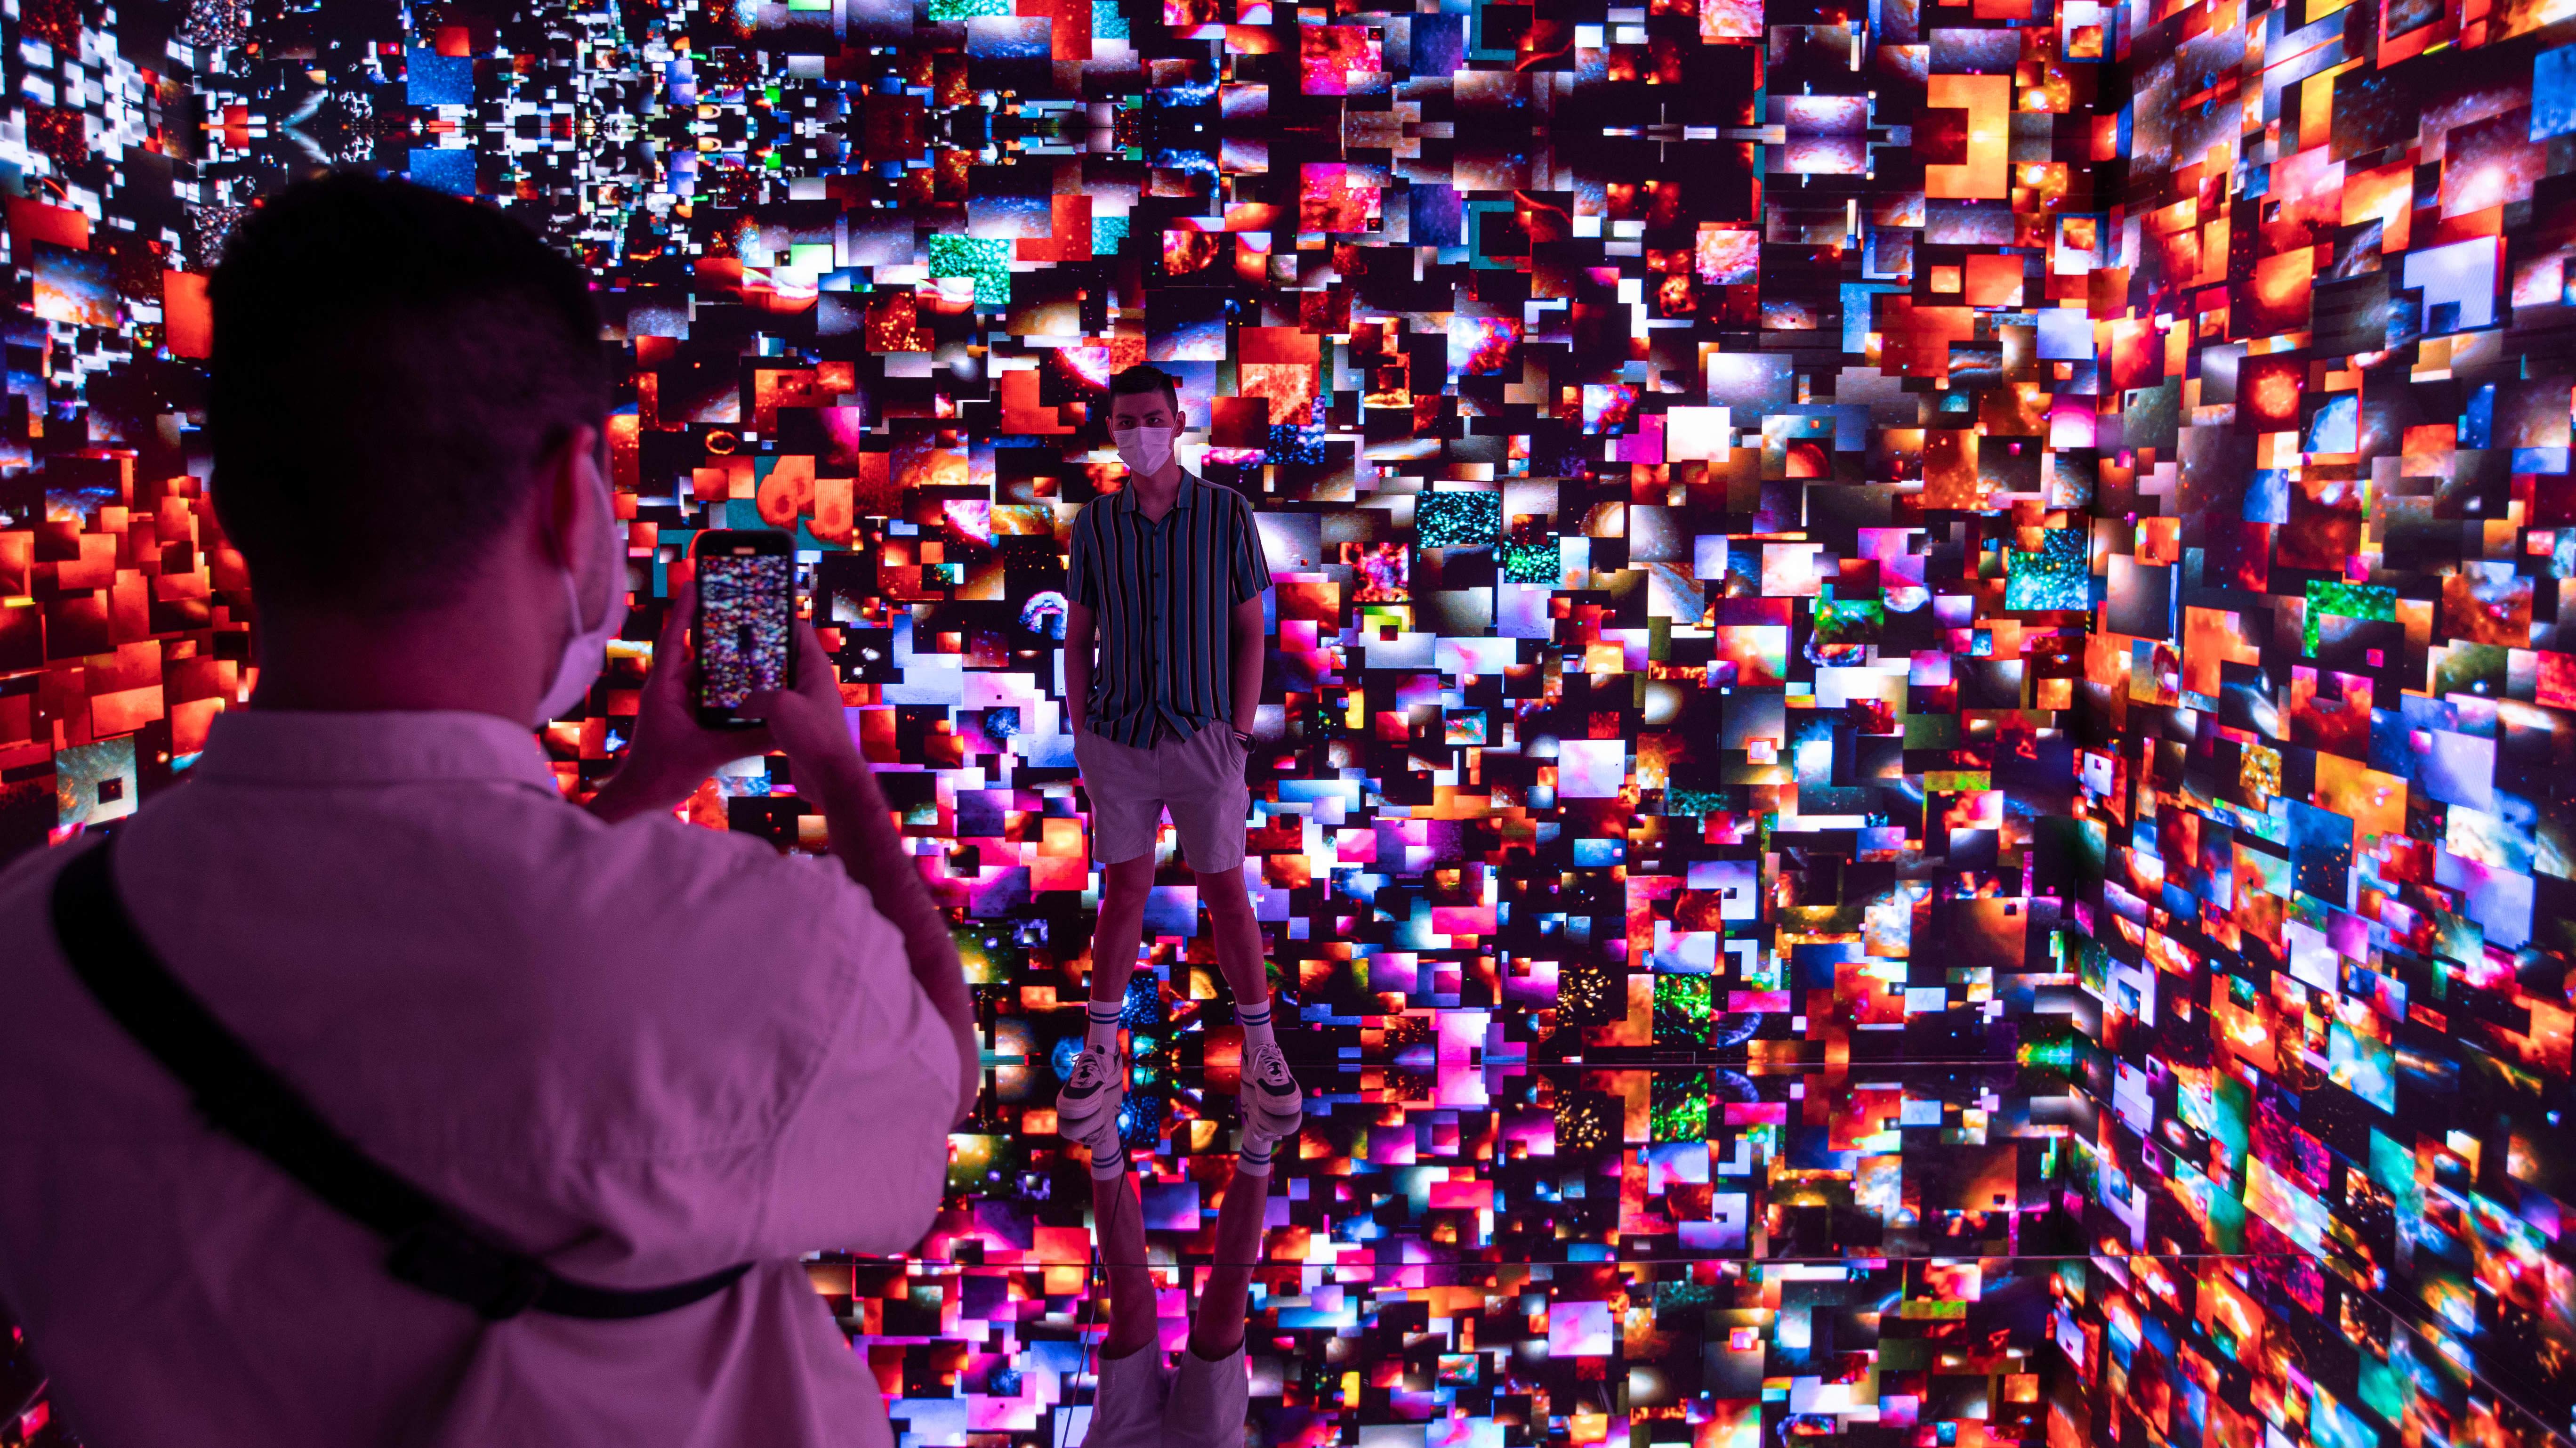 Ihmiset ottivat kuvia Refik Anadolin Machine Hallucination Space: Metaverse Lot 1 -digitaideteoksessa.